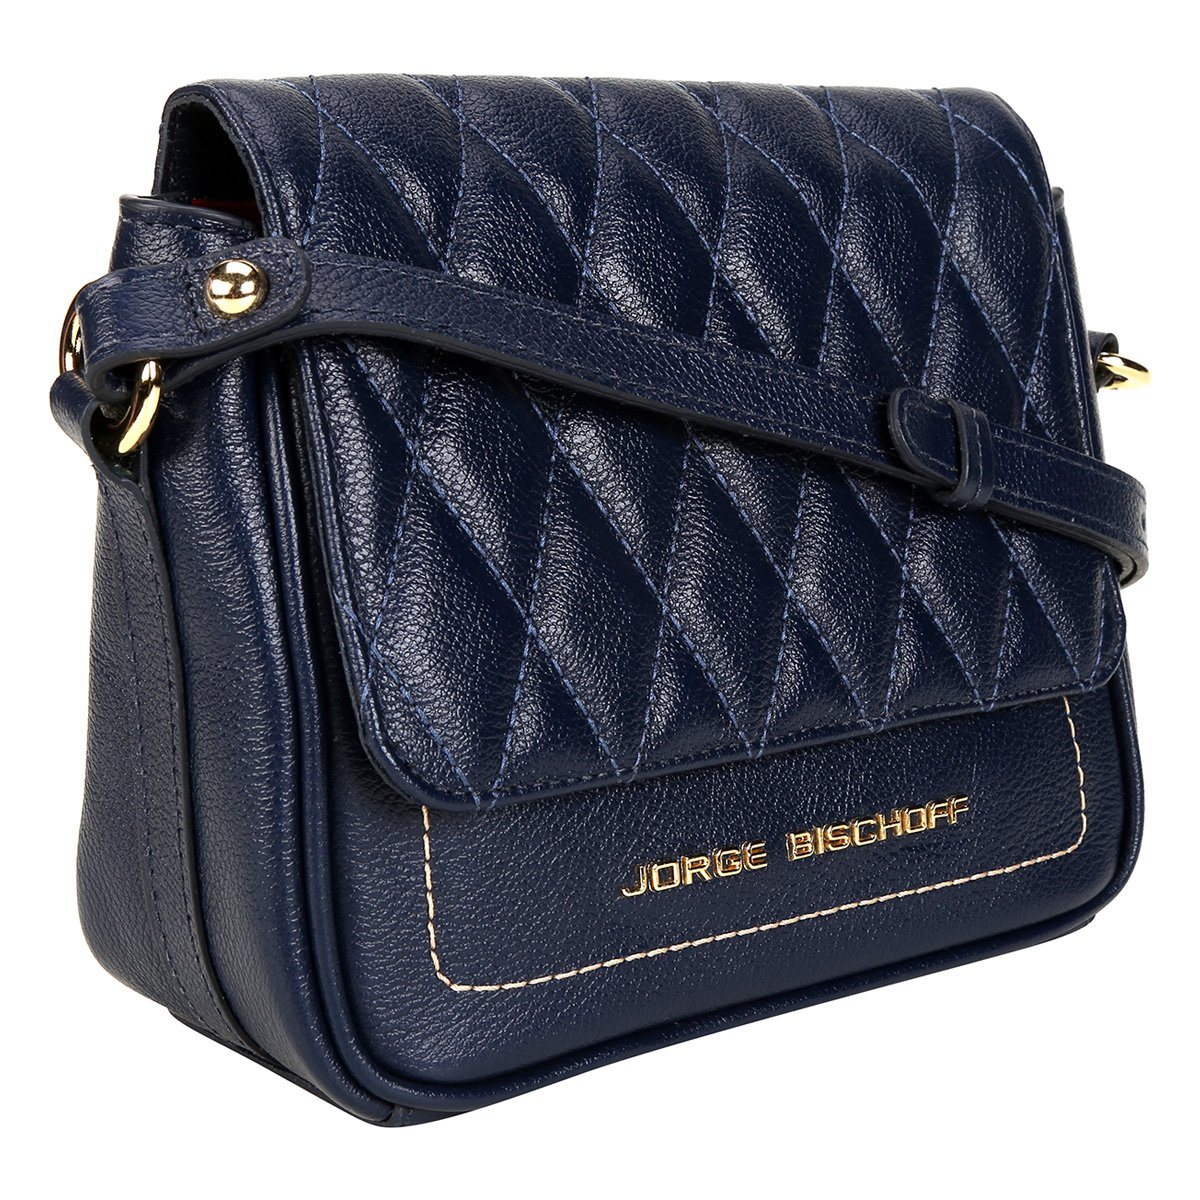 Bolsa Couro Jorge Bischof Mini Bag Matelassê Feminina - Compre Agora ... 1c71907e0aa